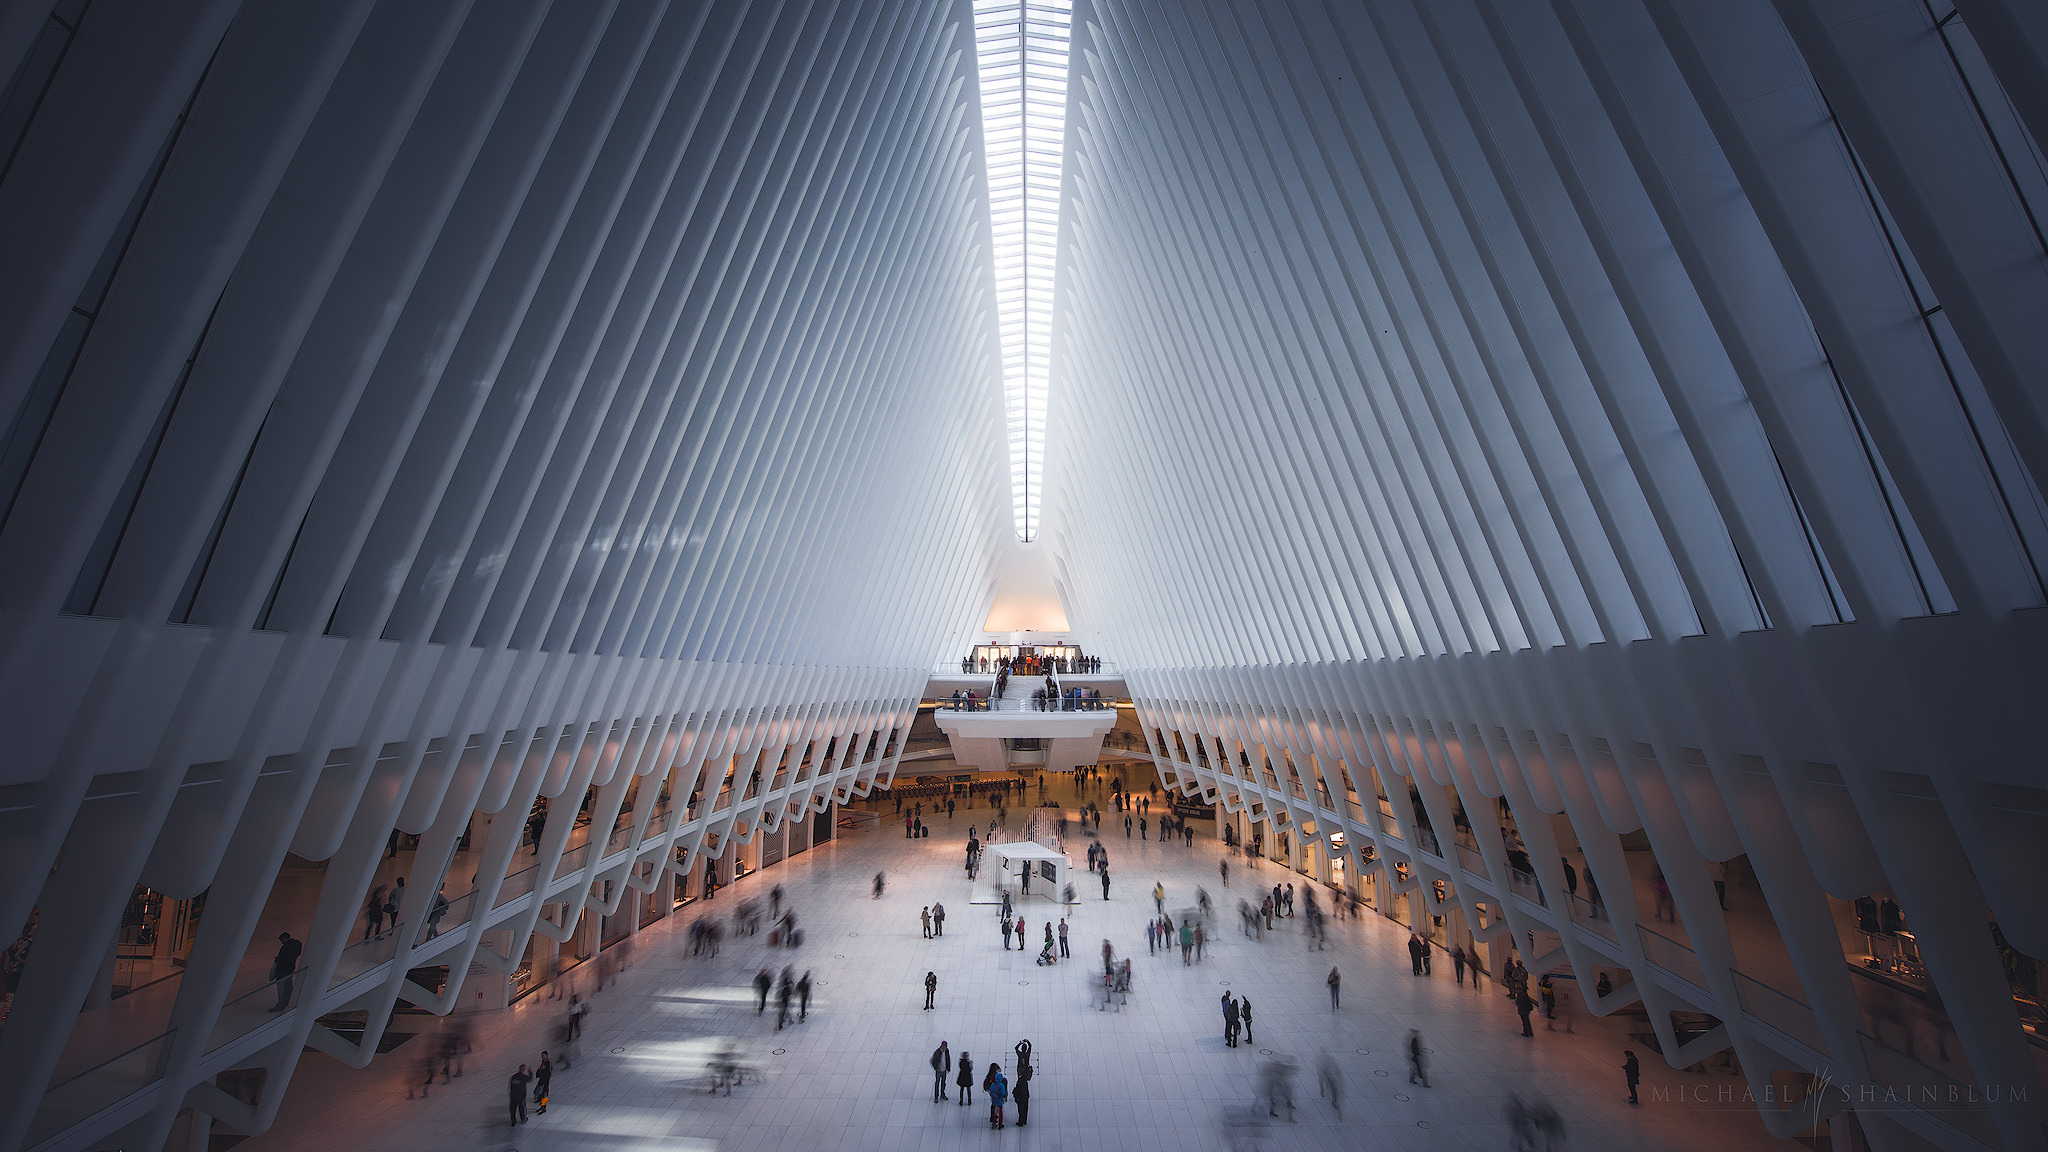 New York City, Oculus World Trade Center Cityscape Photography